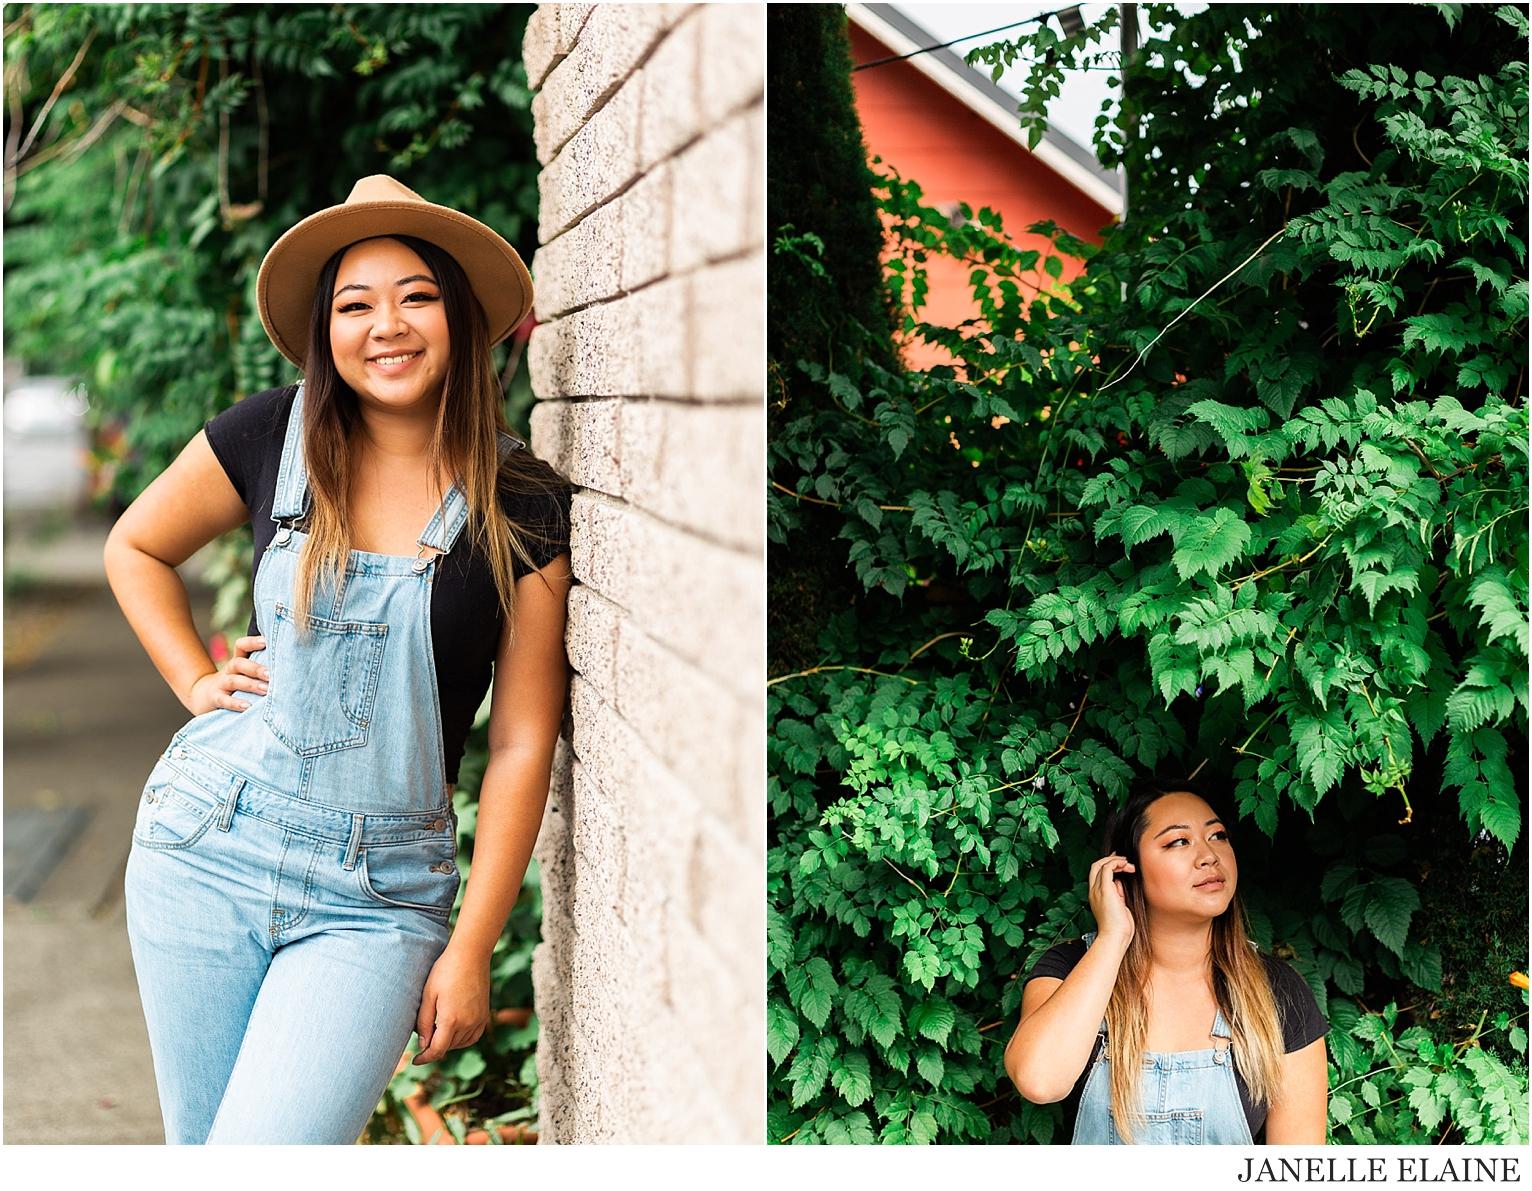 Aiko-Seattle WA-lifestyle photoshoot-Renton-Janelle Elaine Photography-3.jpg